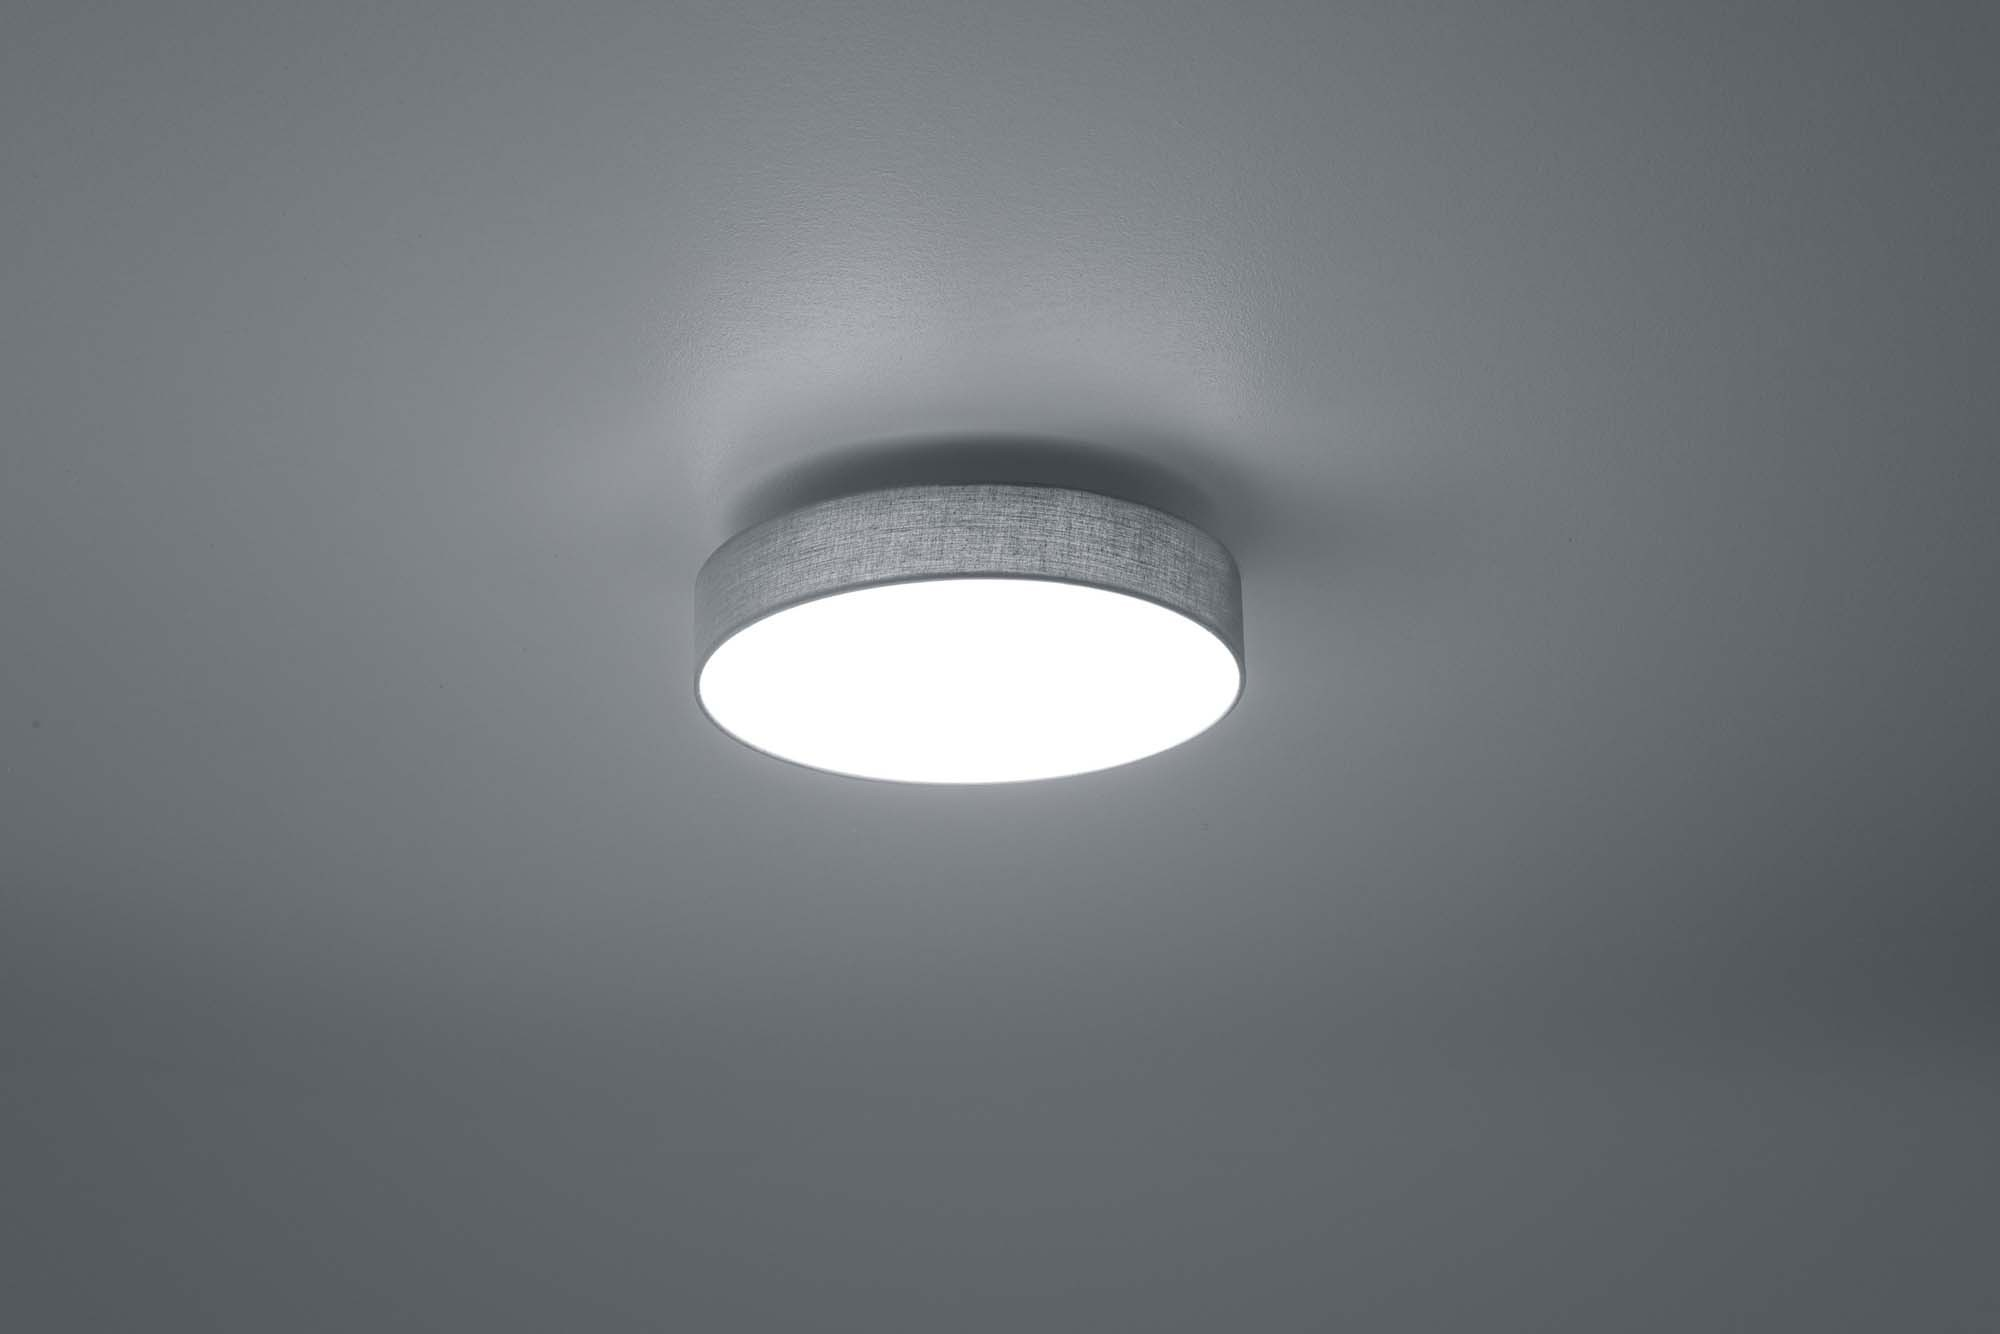 Plafoniera Tessuto Design : Plafoniera moderna a led 11w in tessuto grigio trio 621911211 lugano